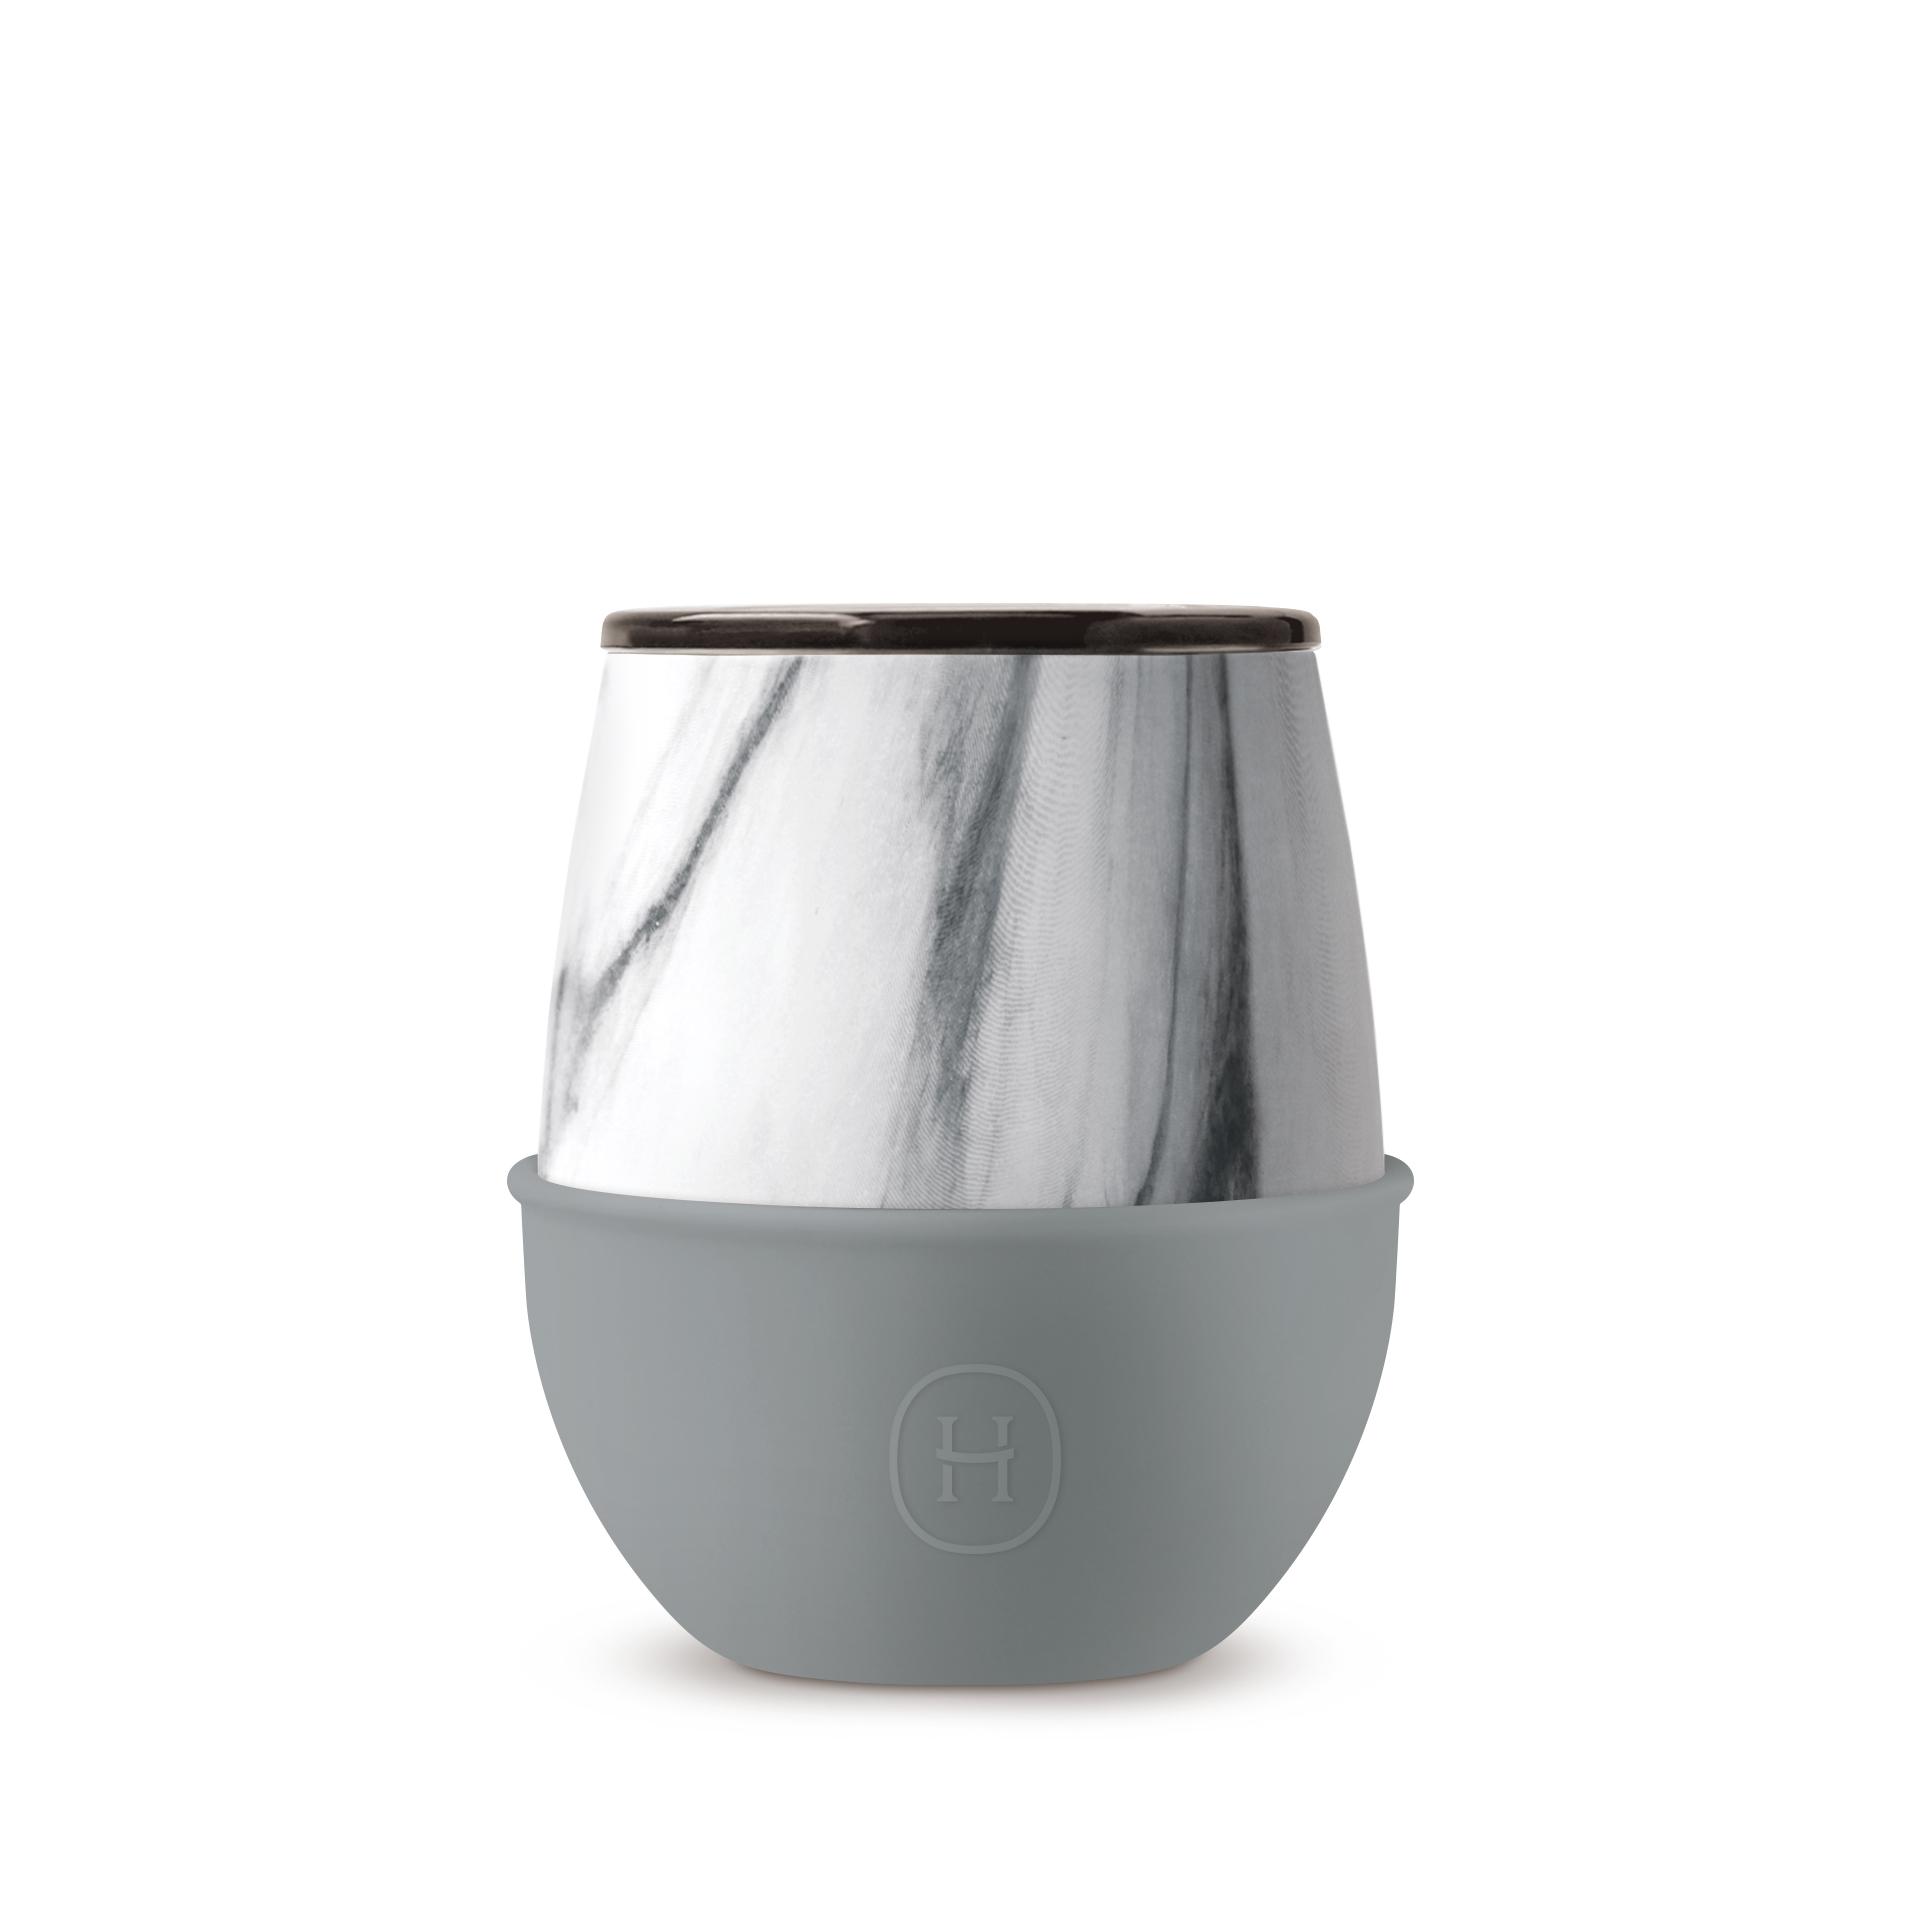 美國 HYDY Delicia 大理石紋蛋型杯 峽灣 240ml